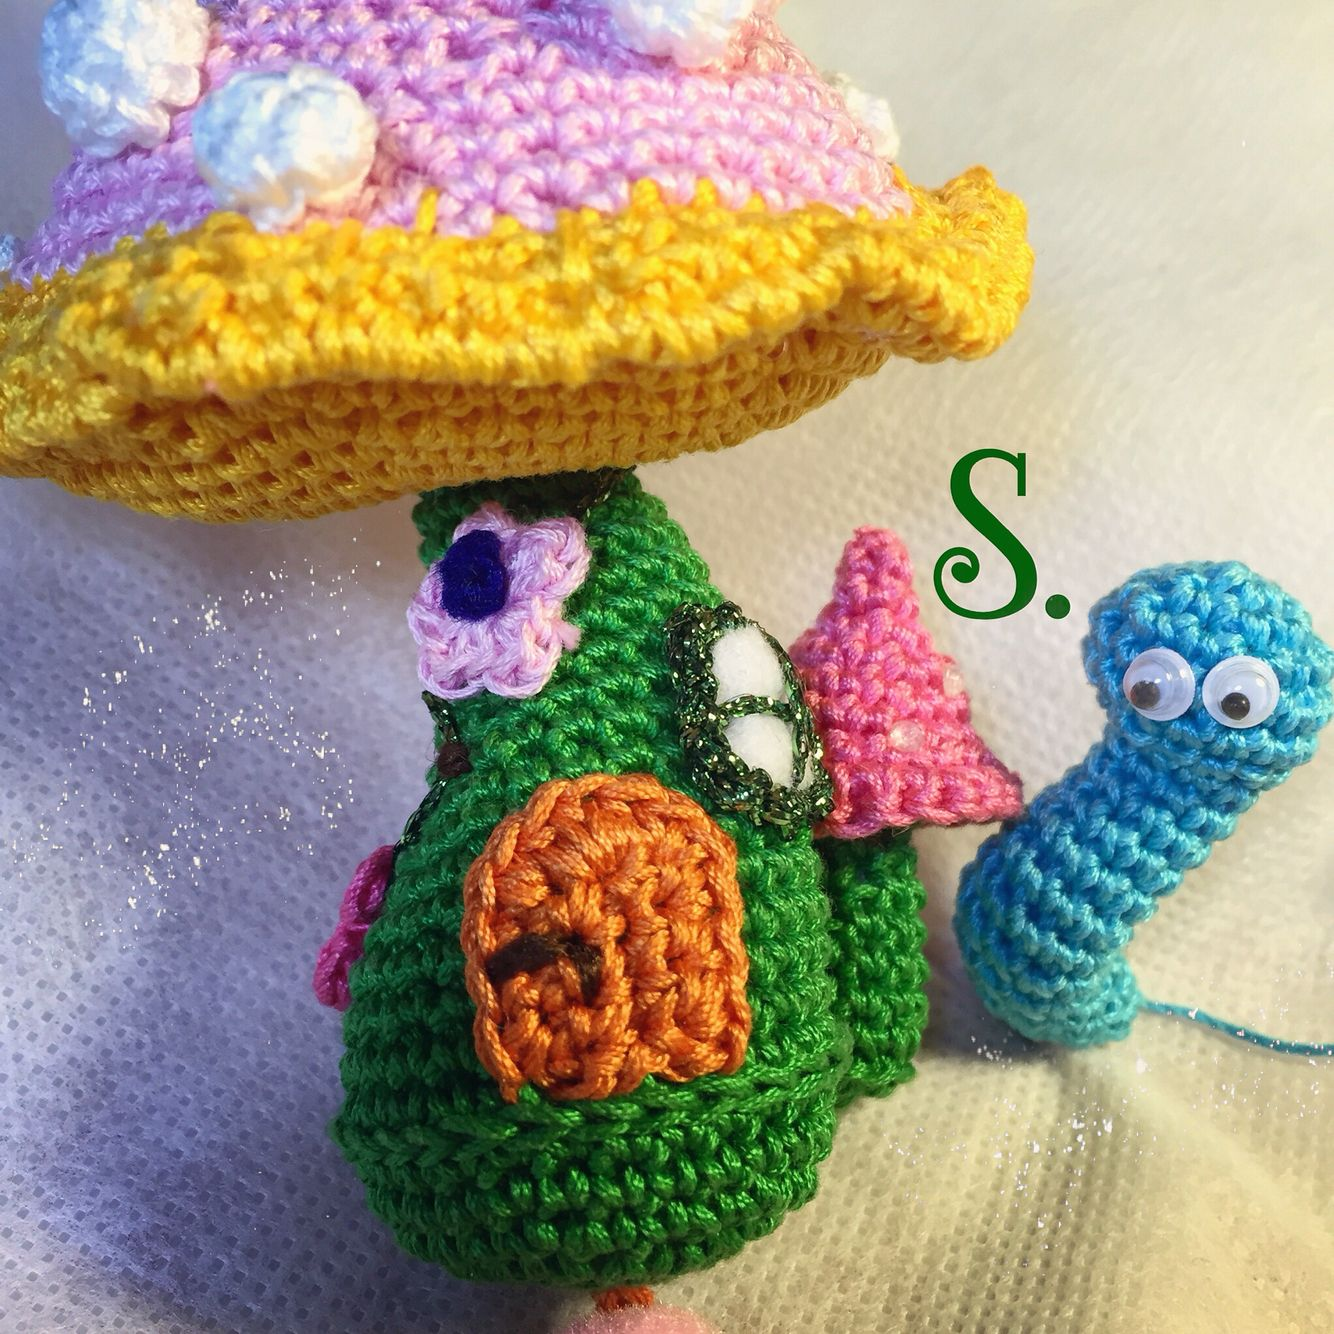 Fairy house mushroom crochet amigurumi.   crochet whimsies   Pinterest